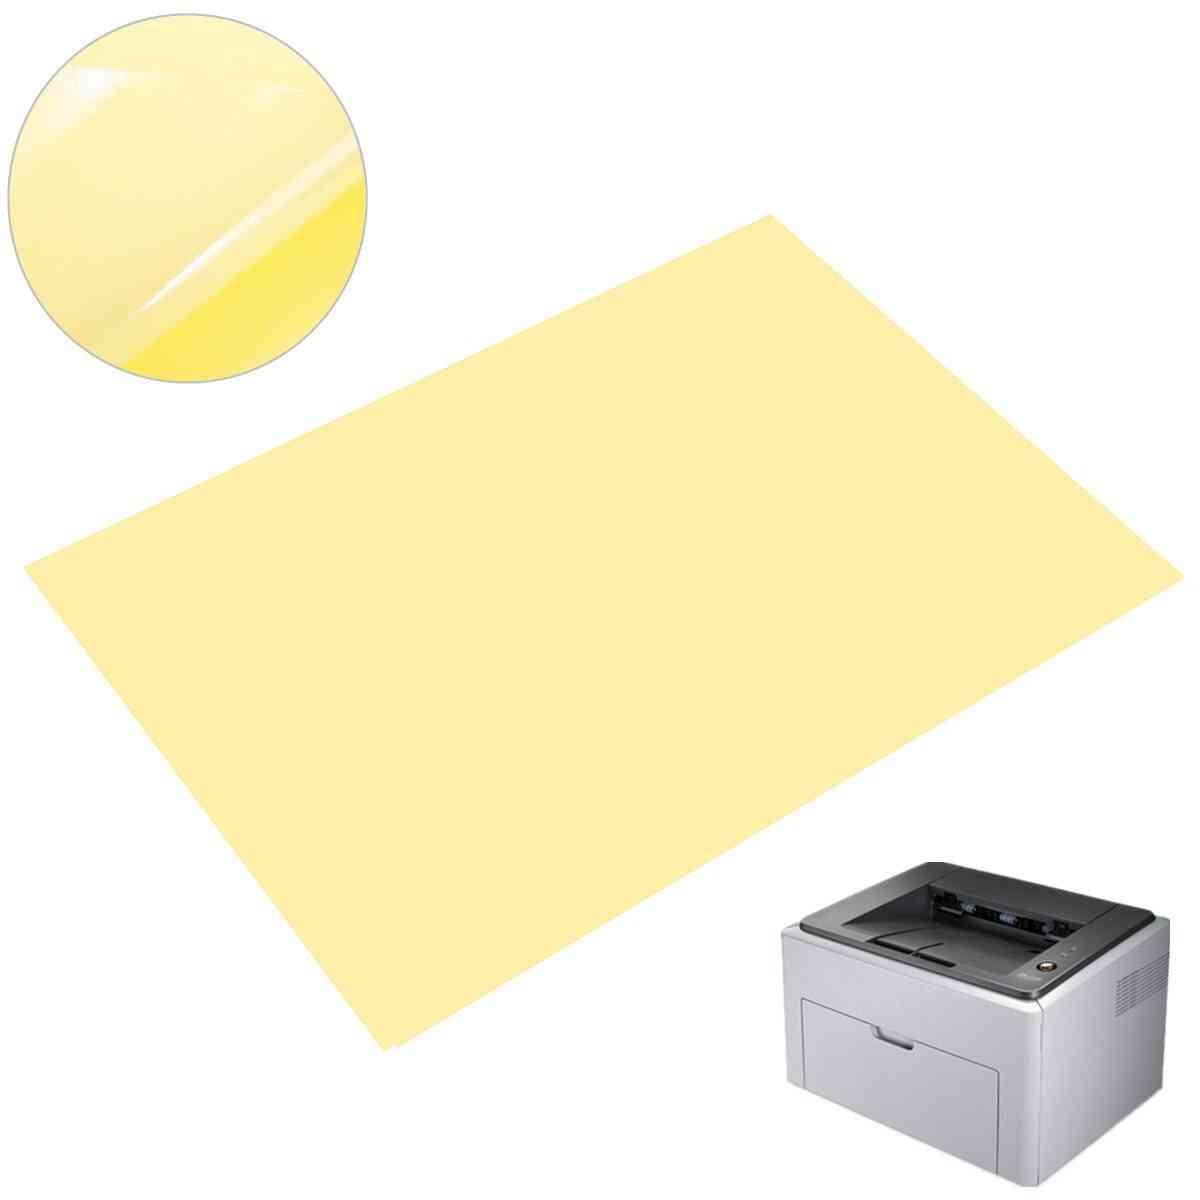 A4 Pvc Self Adhesive Sticker For Laser Printer Lamination